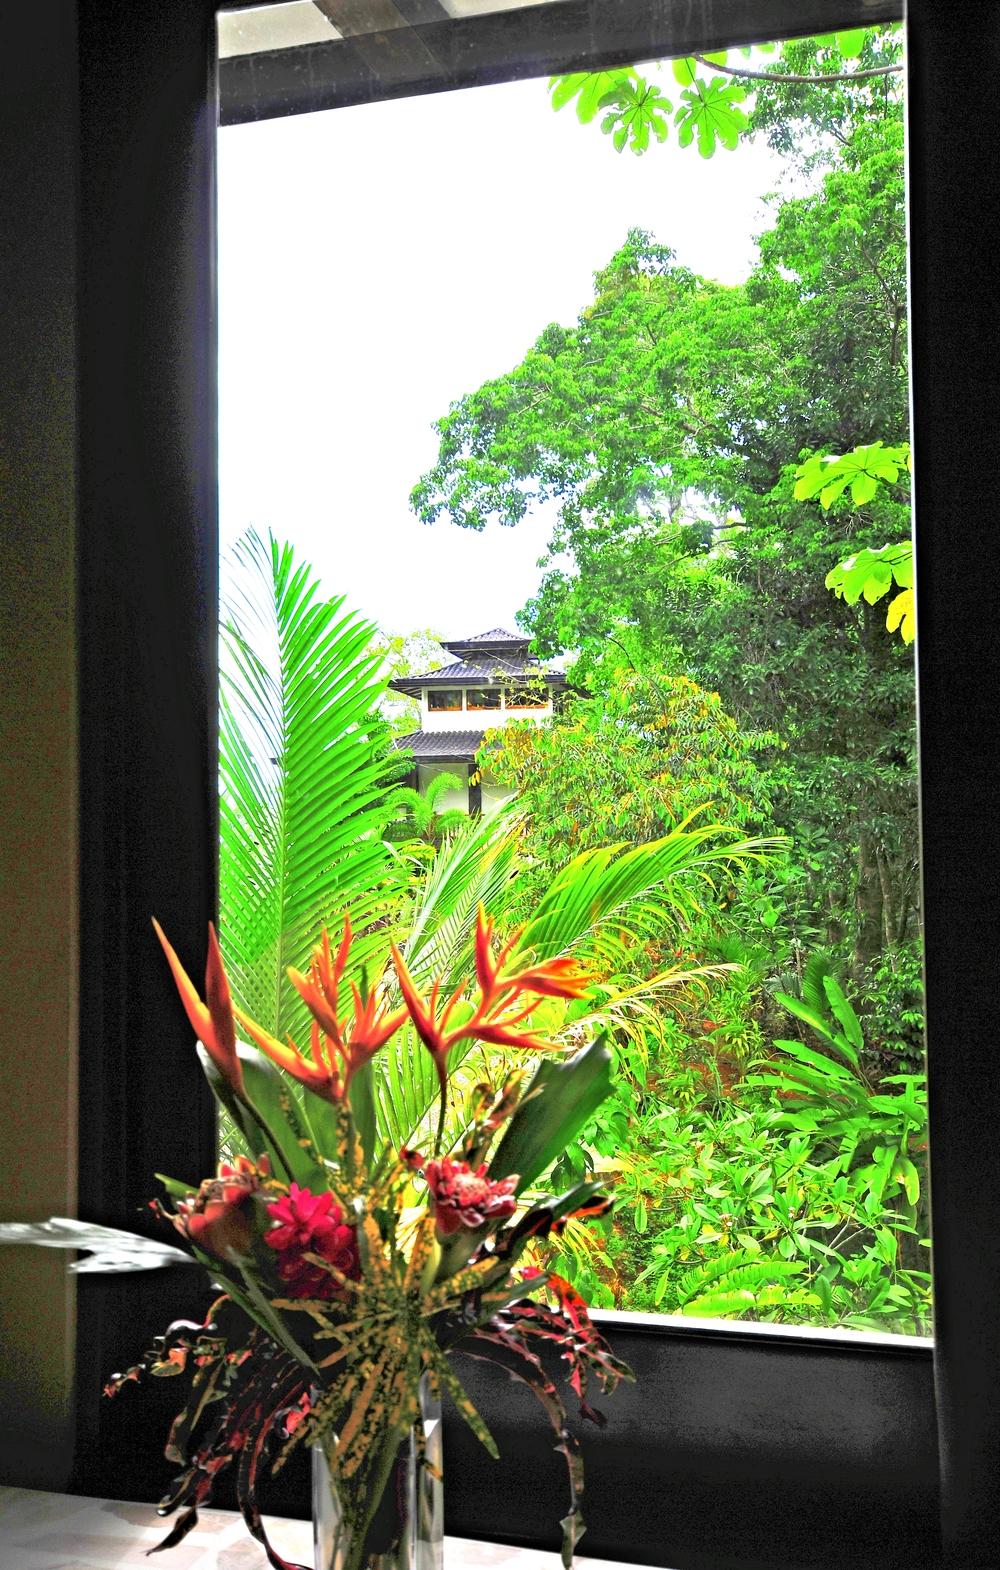 Leighanne pics pagoda caribaea 003.jpg